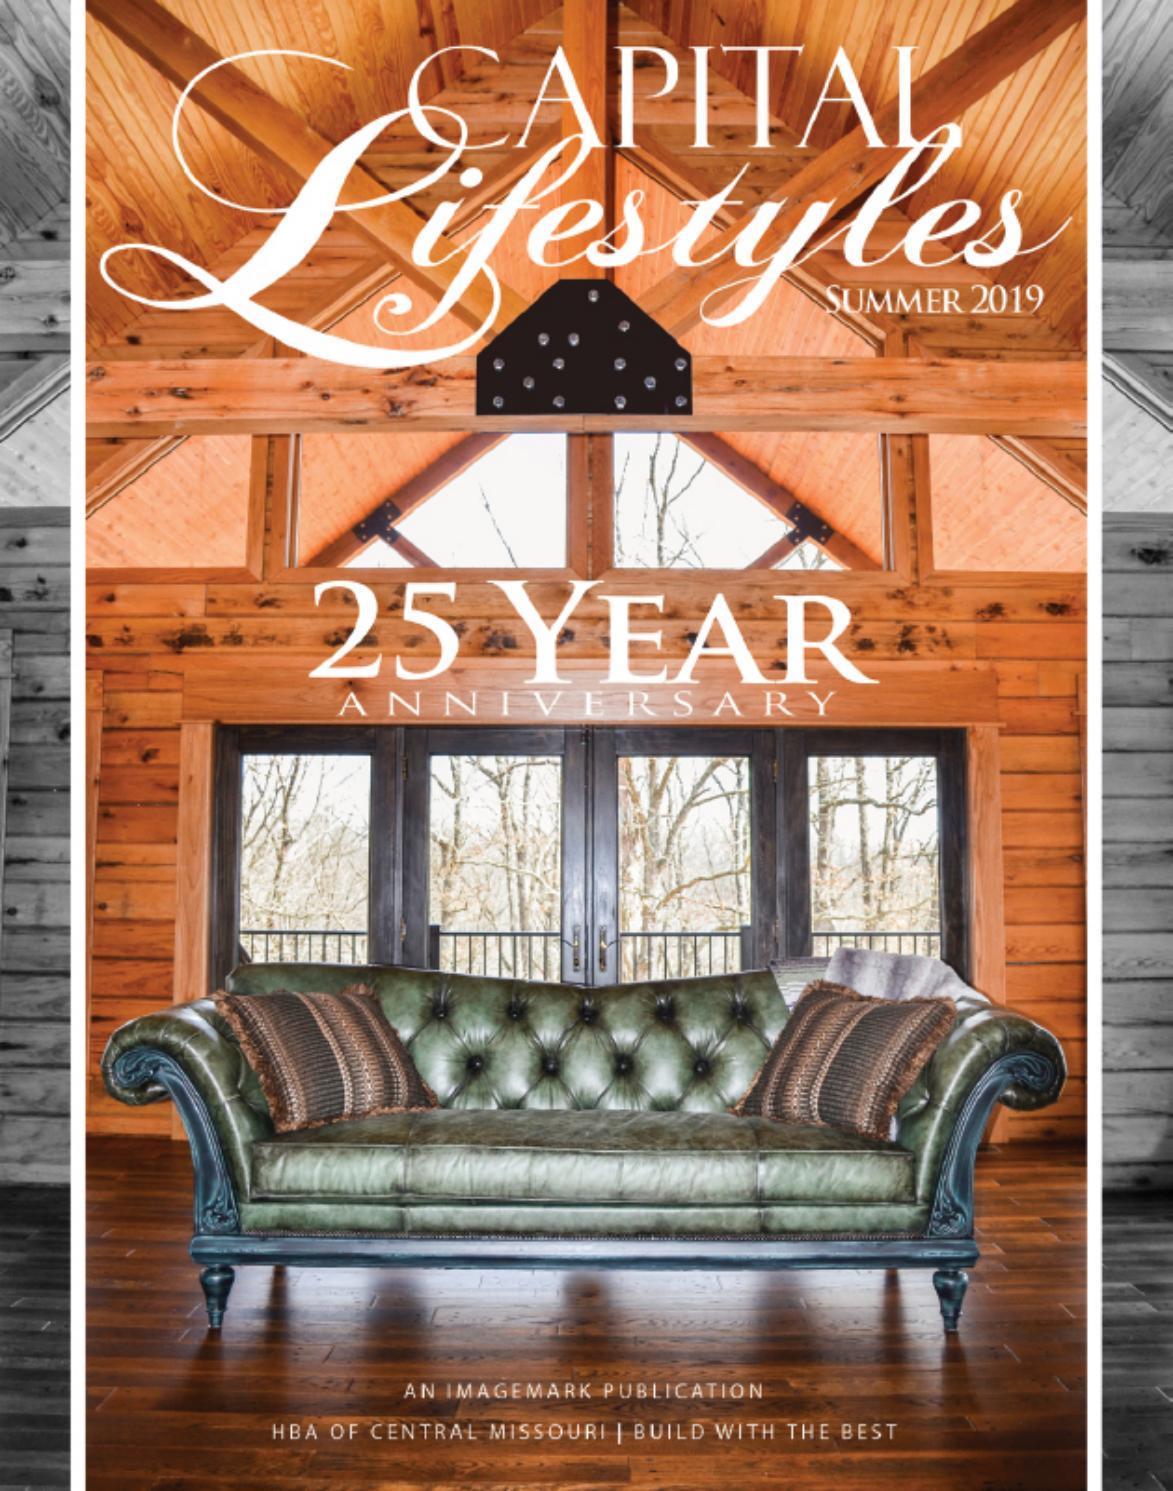 Capital Lifestyles Summer 2019 By Imagemark Issuu